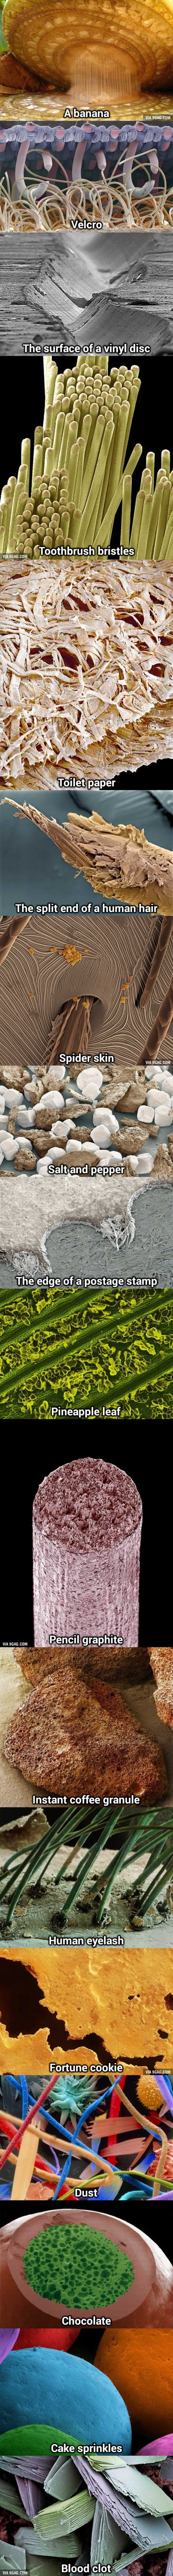 life under the microscope